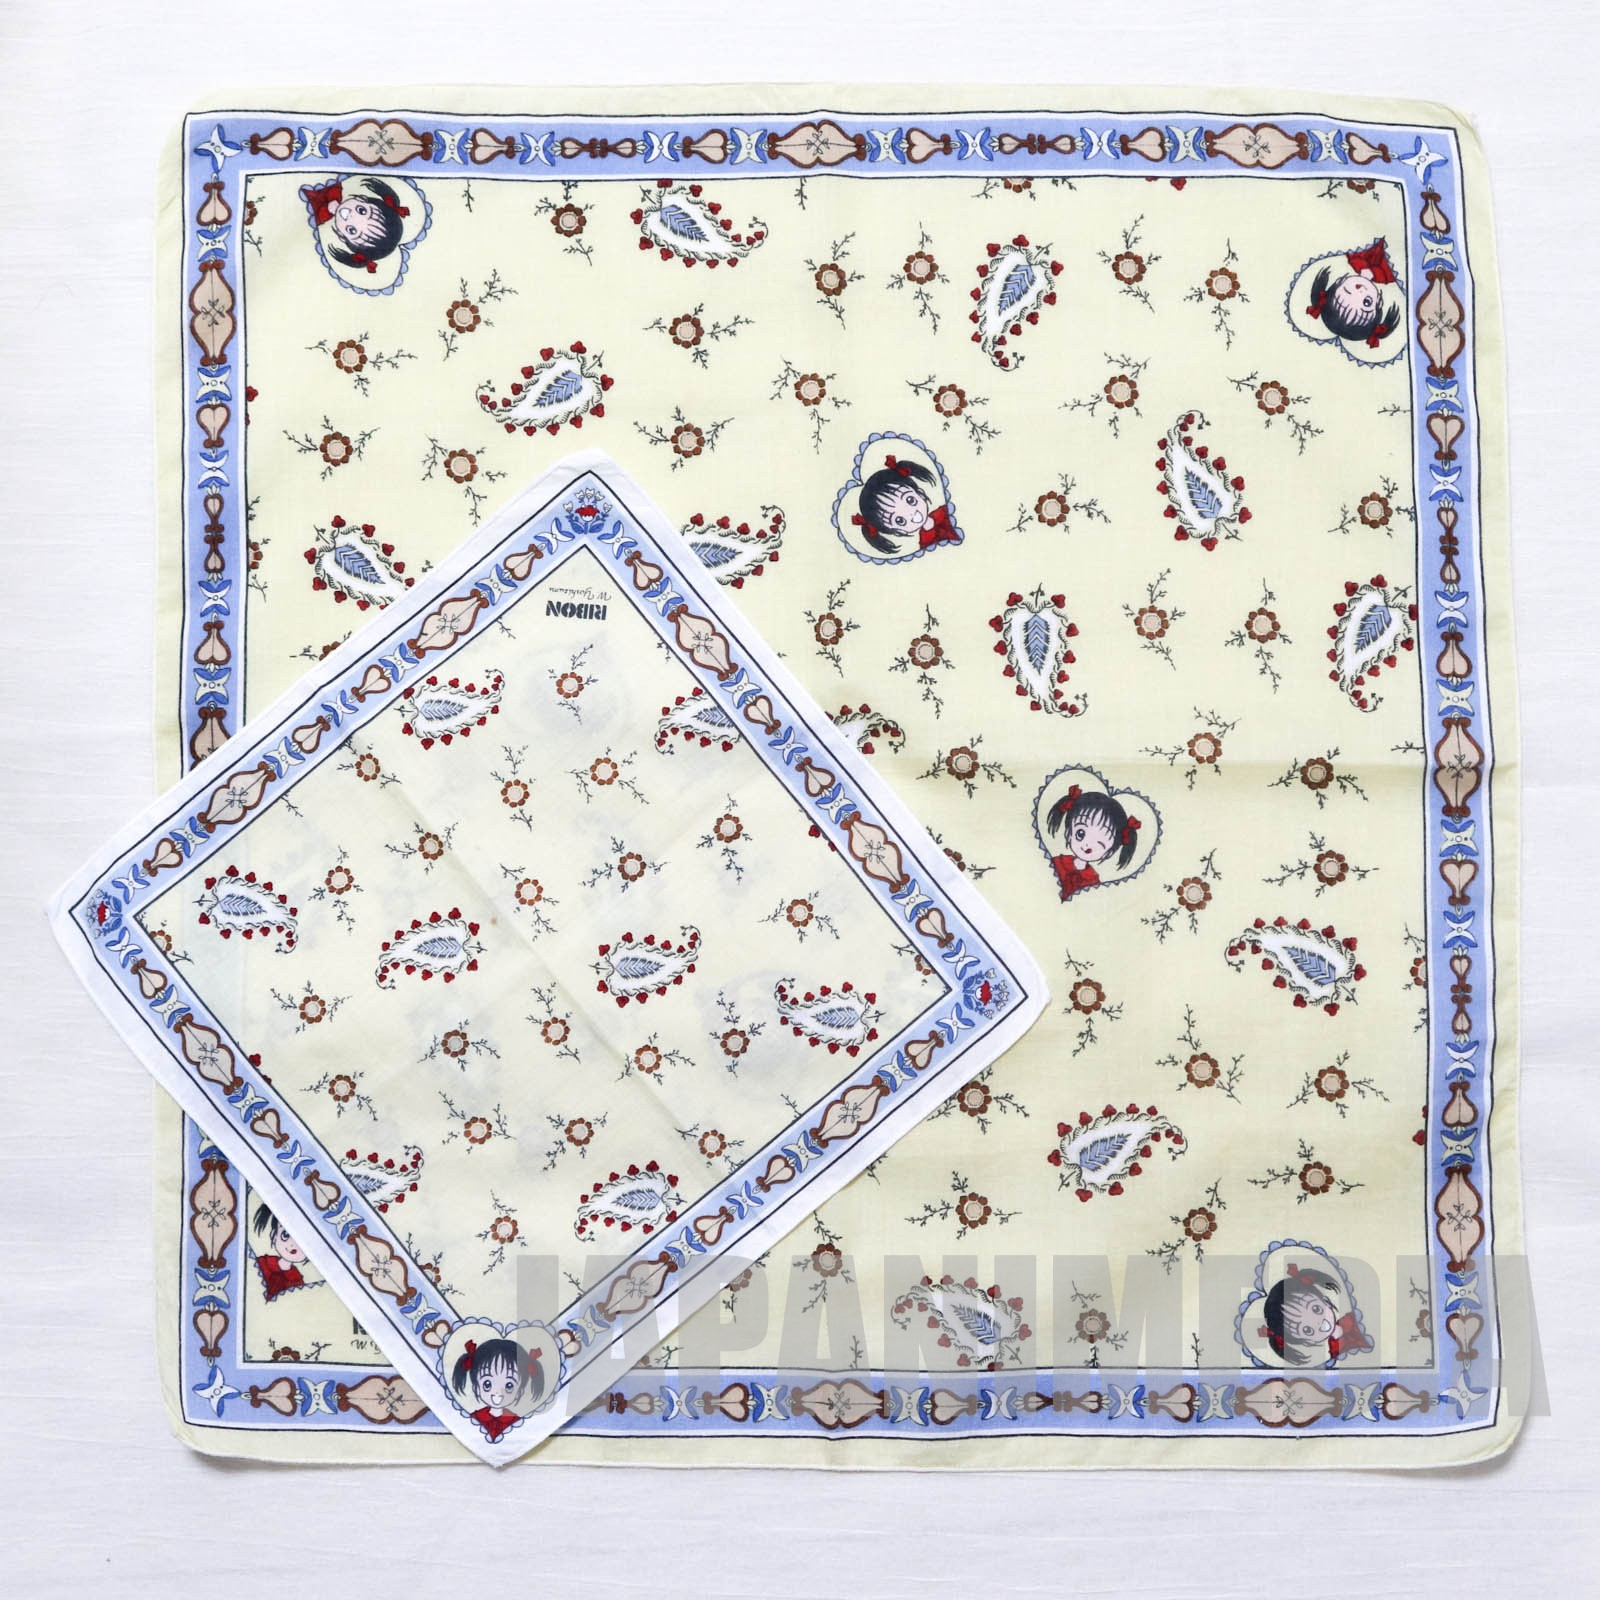 Marmalade Boy Handkerchief & Bandana Set [Miki Koishikawa] JAPAN ANIME